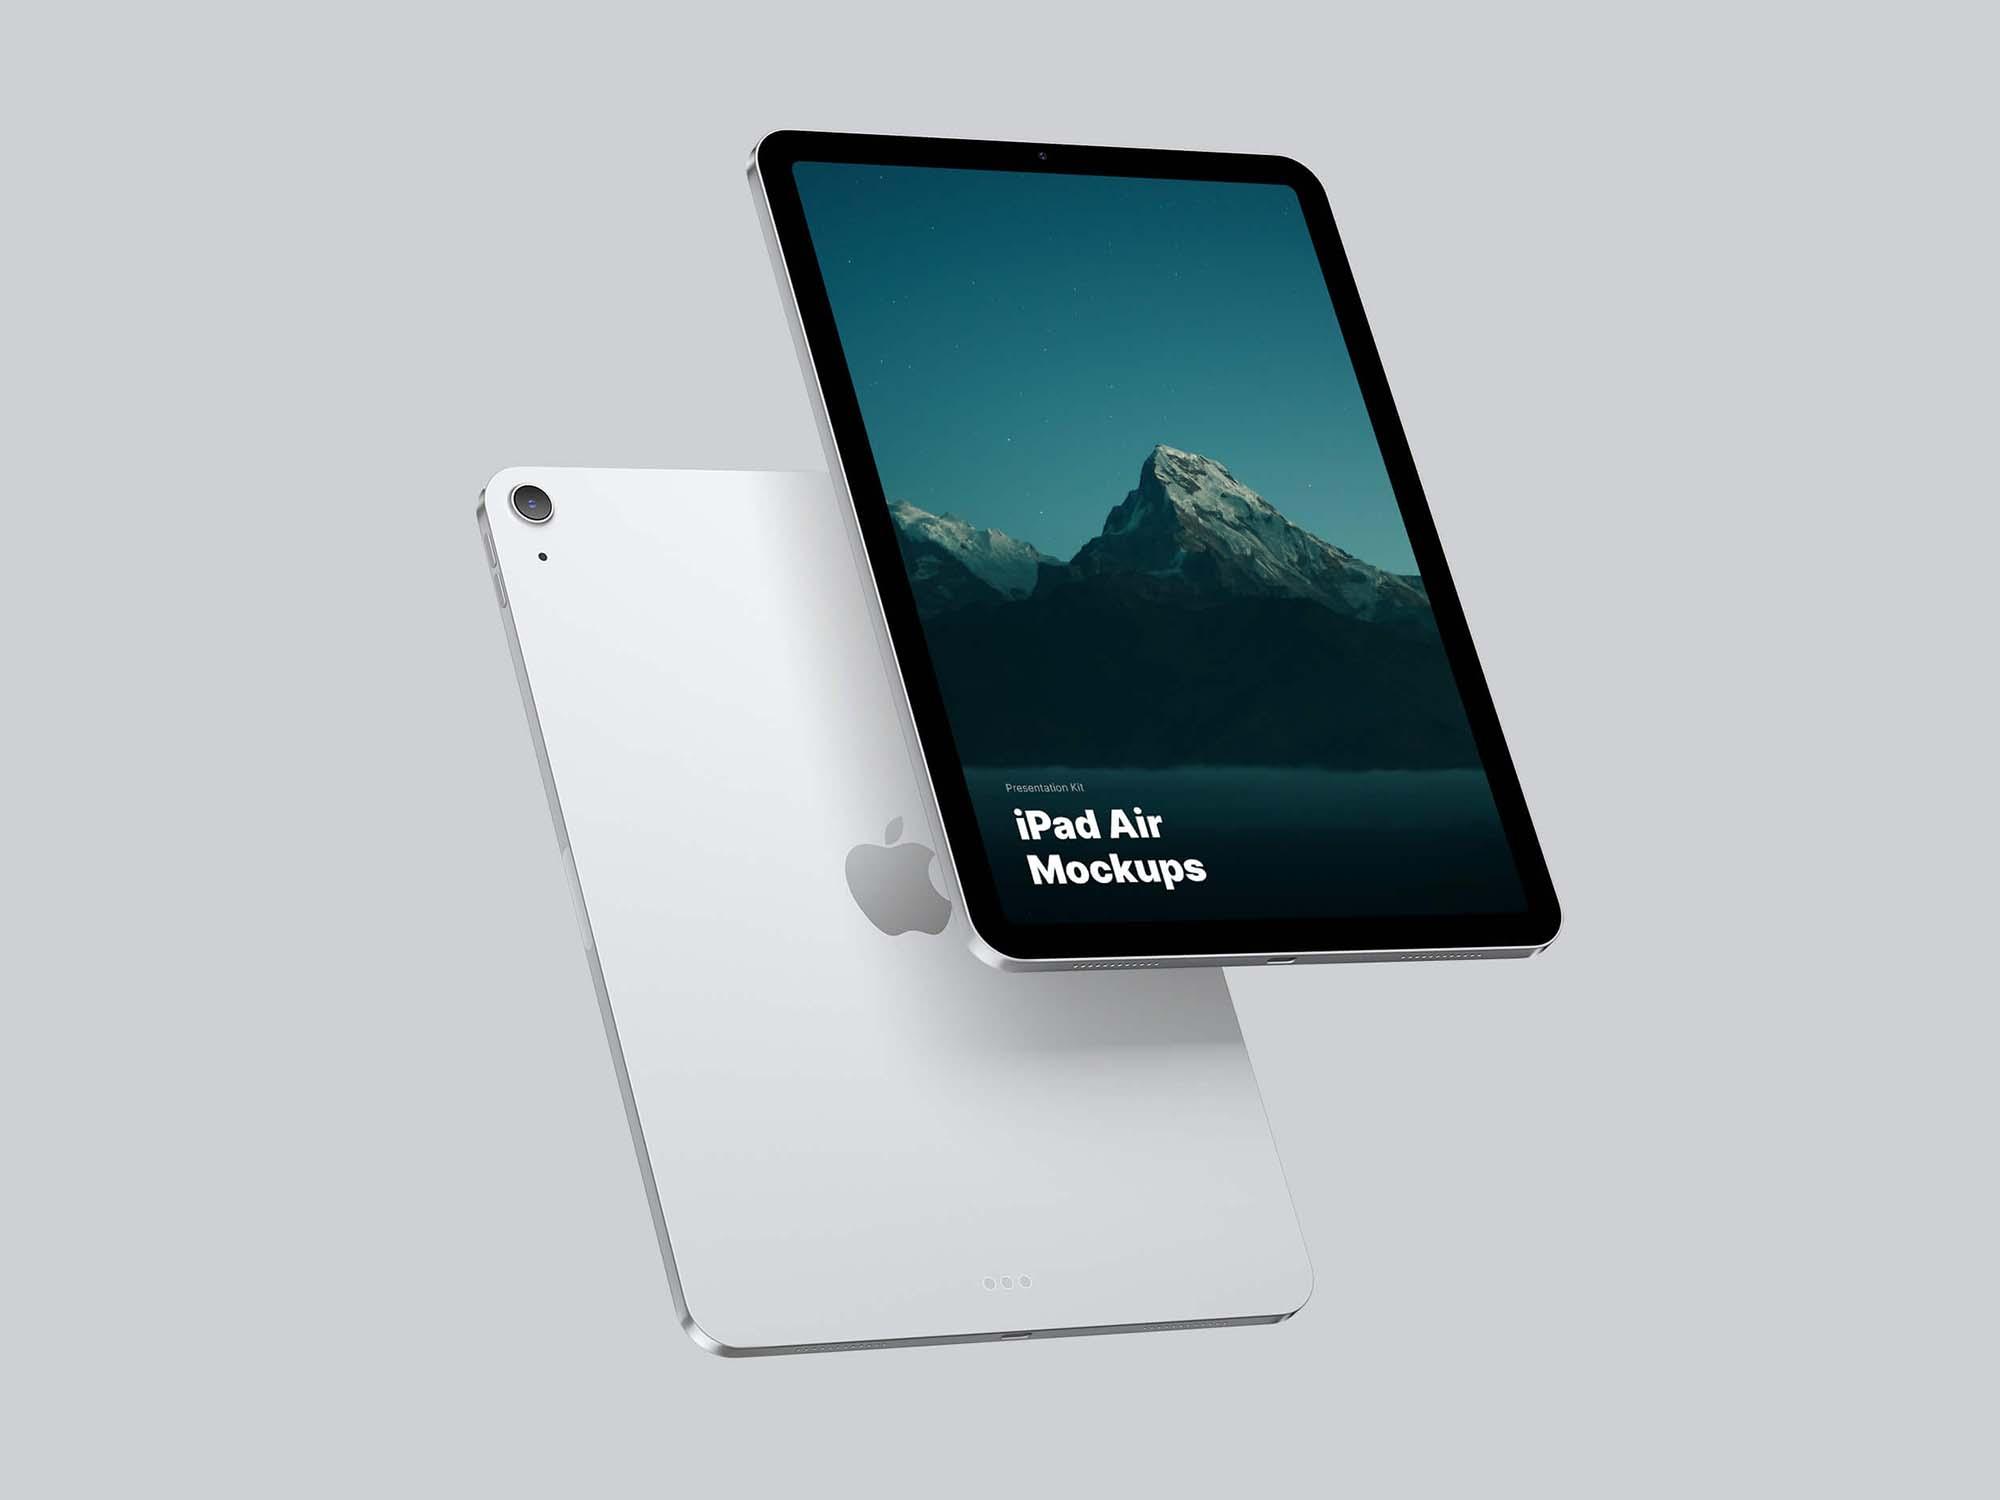 iPad Air Mockup 2